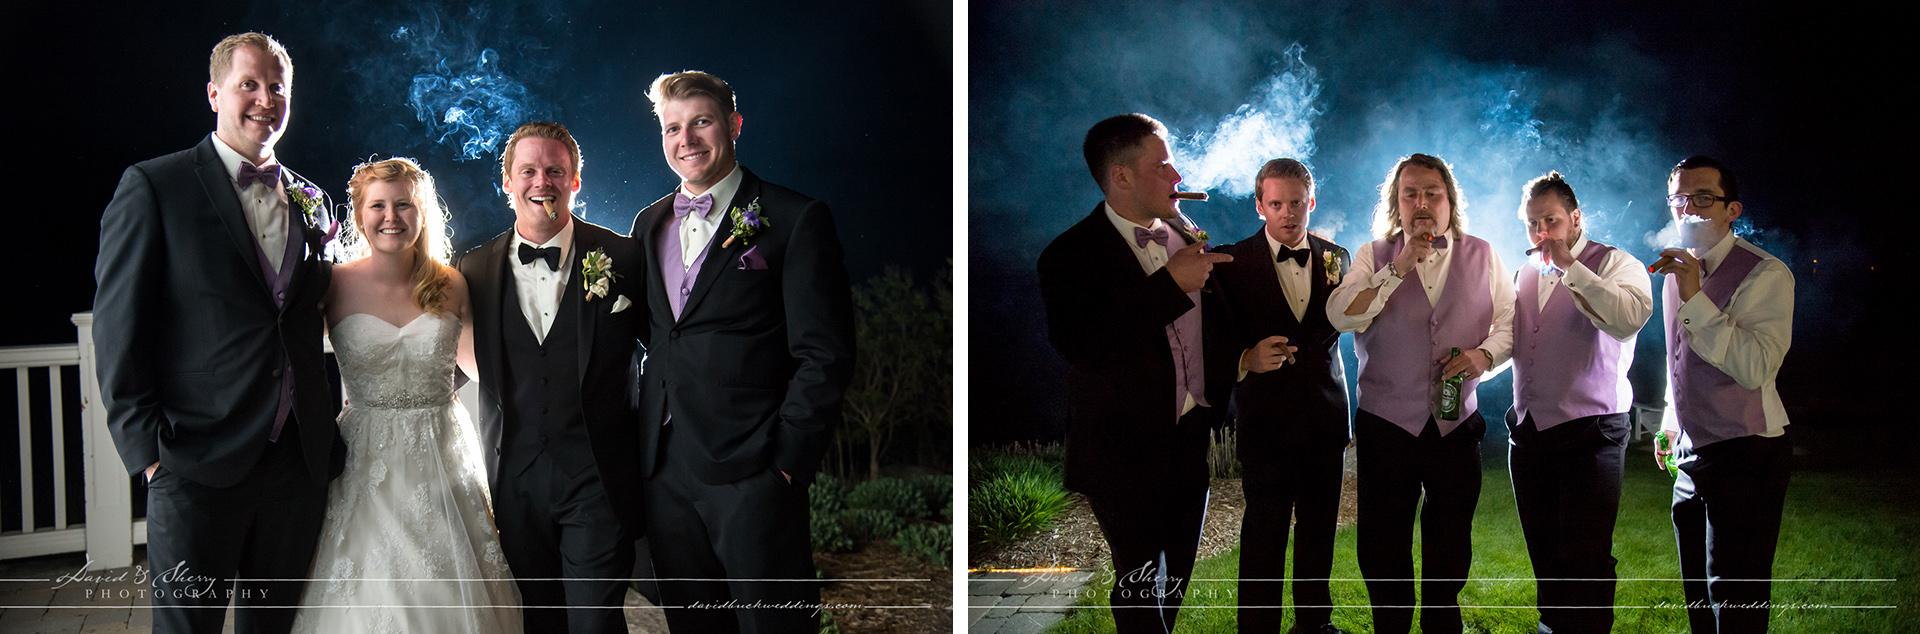 Cobble_Beach_Wedding_Photography_37